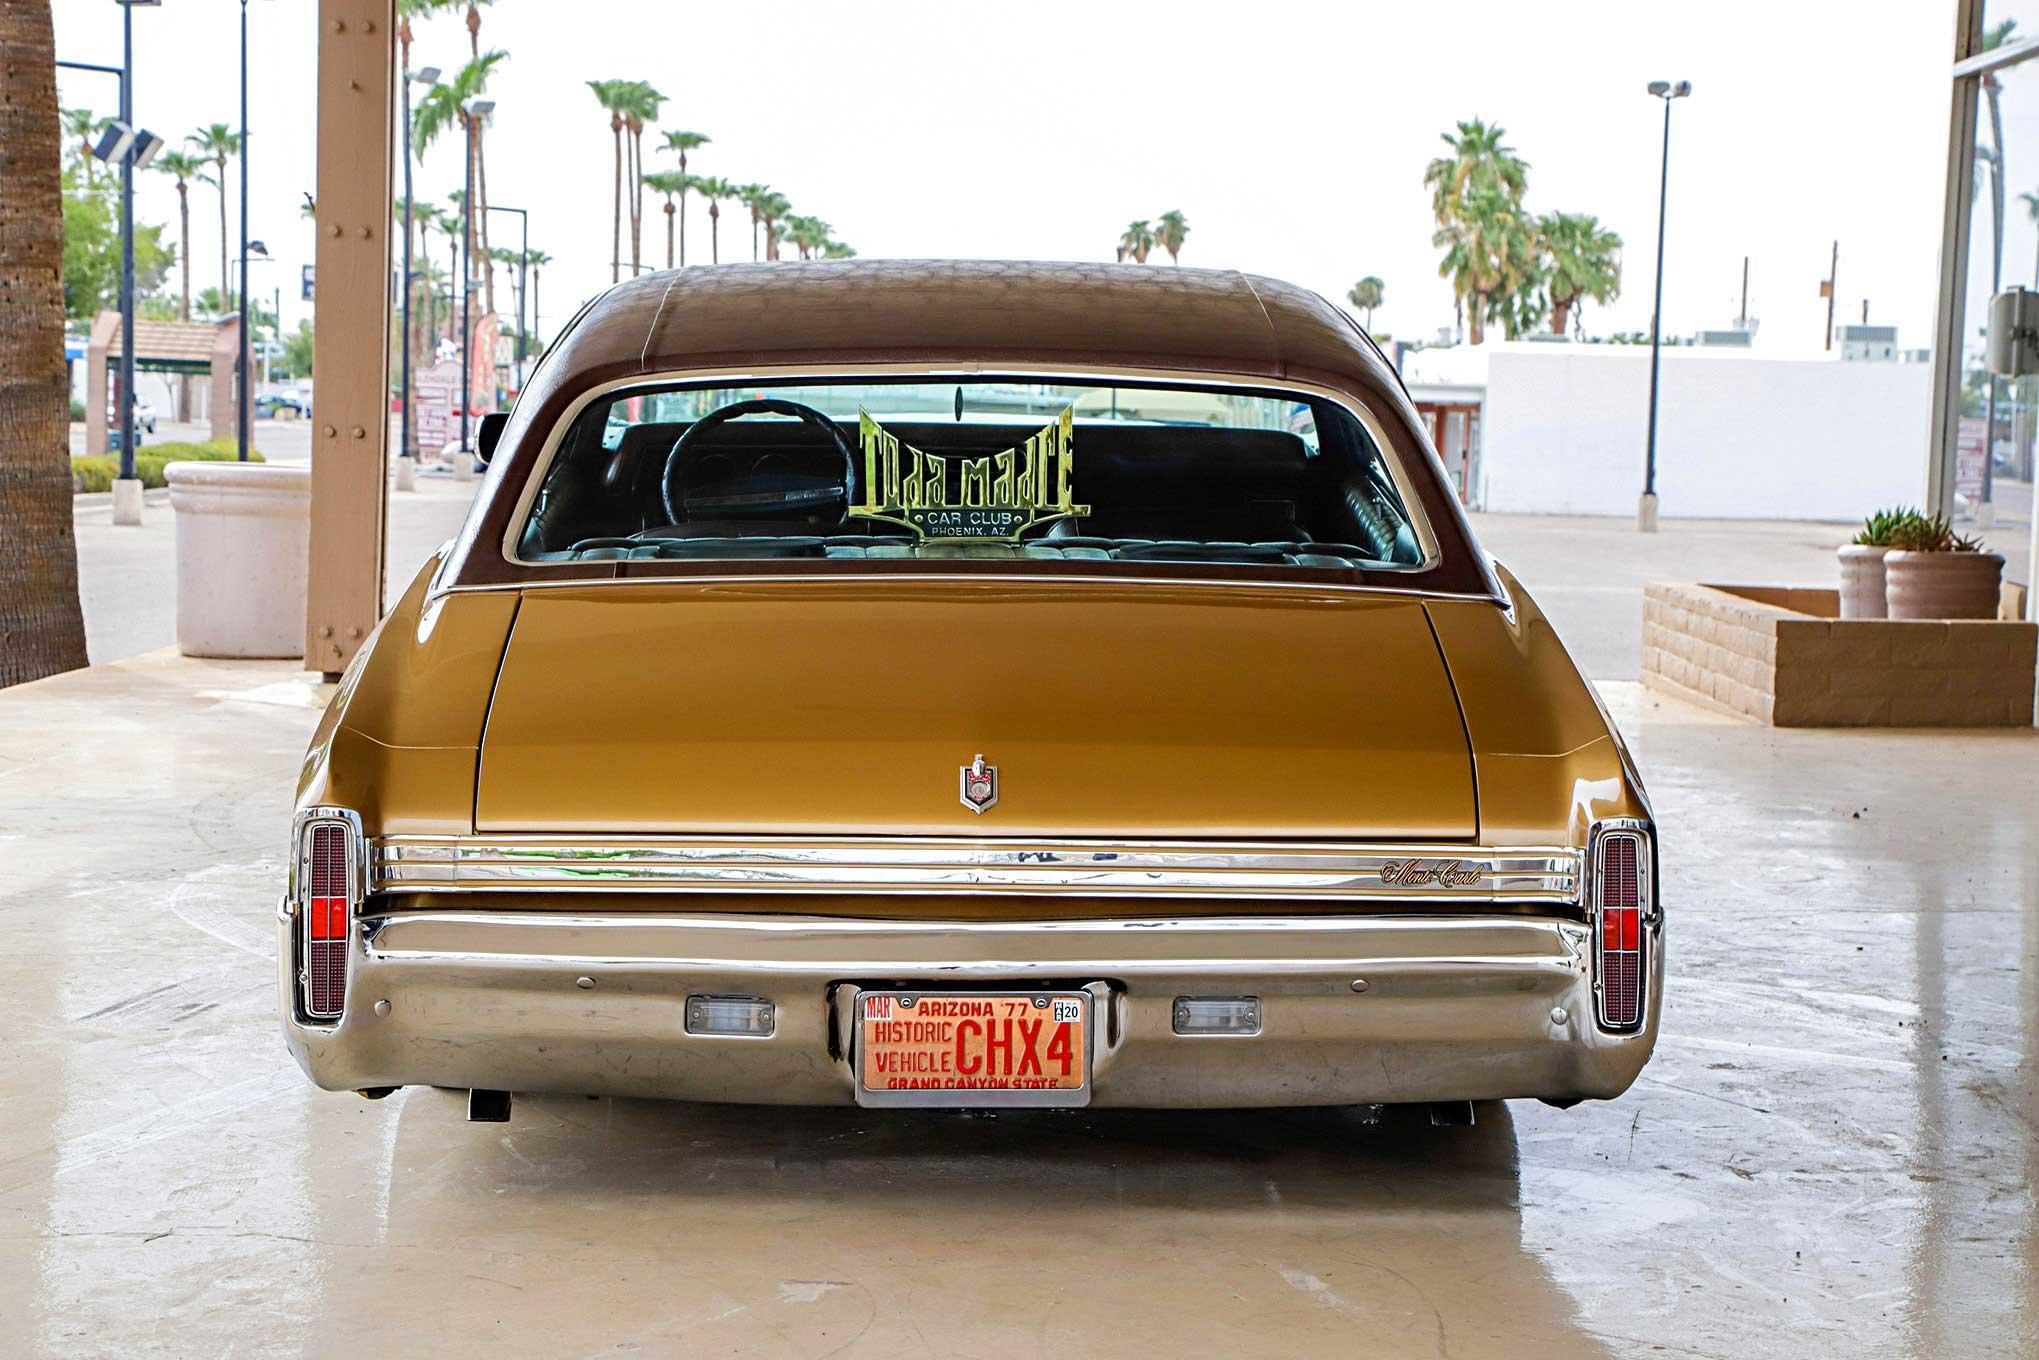 1972 Chevrolet Monte Carlo Rear Bumper